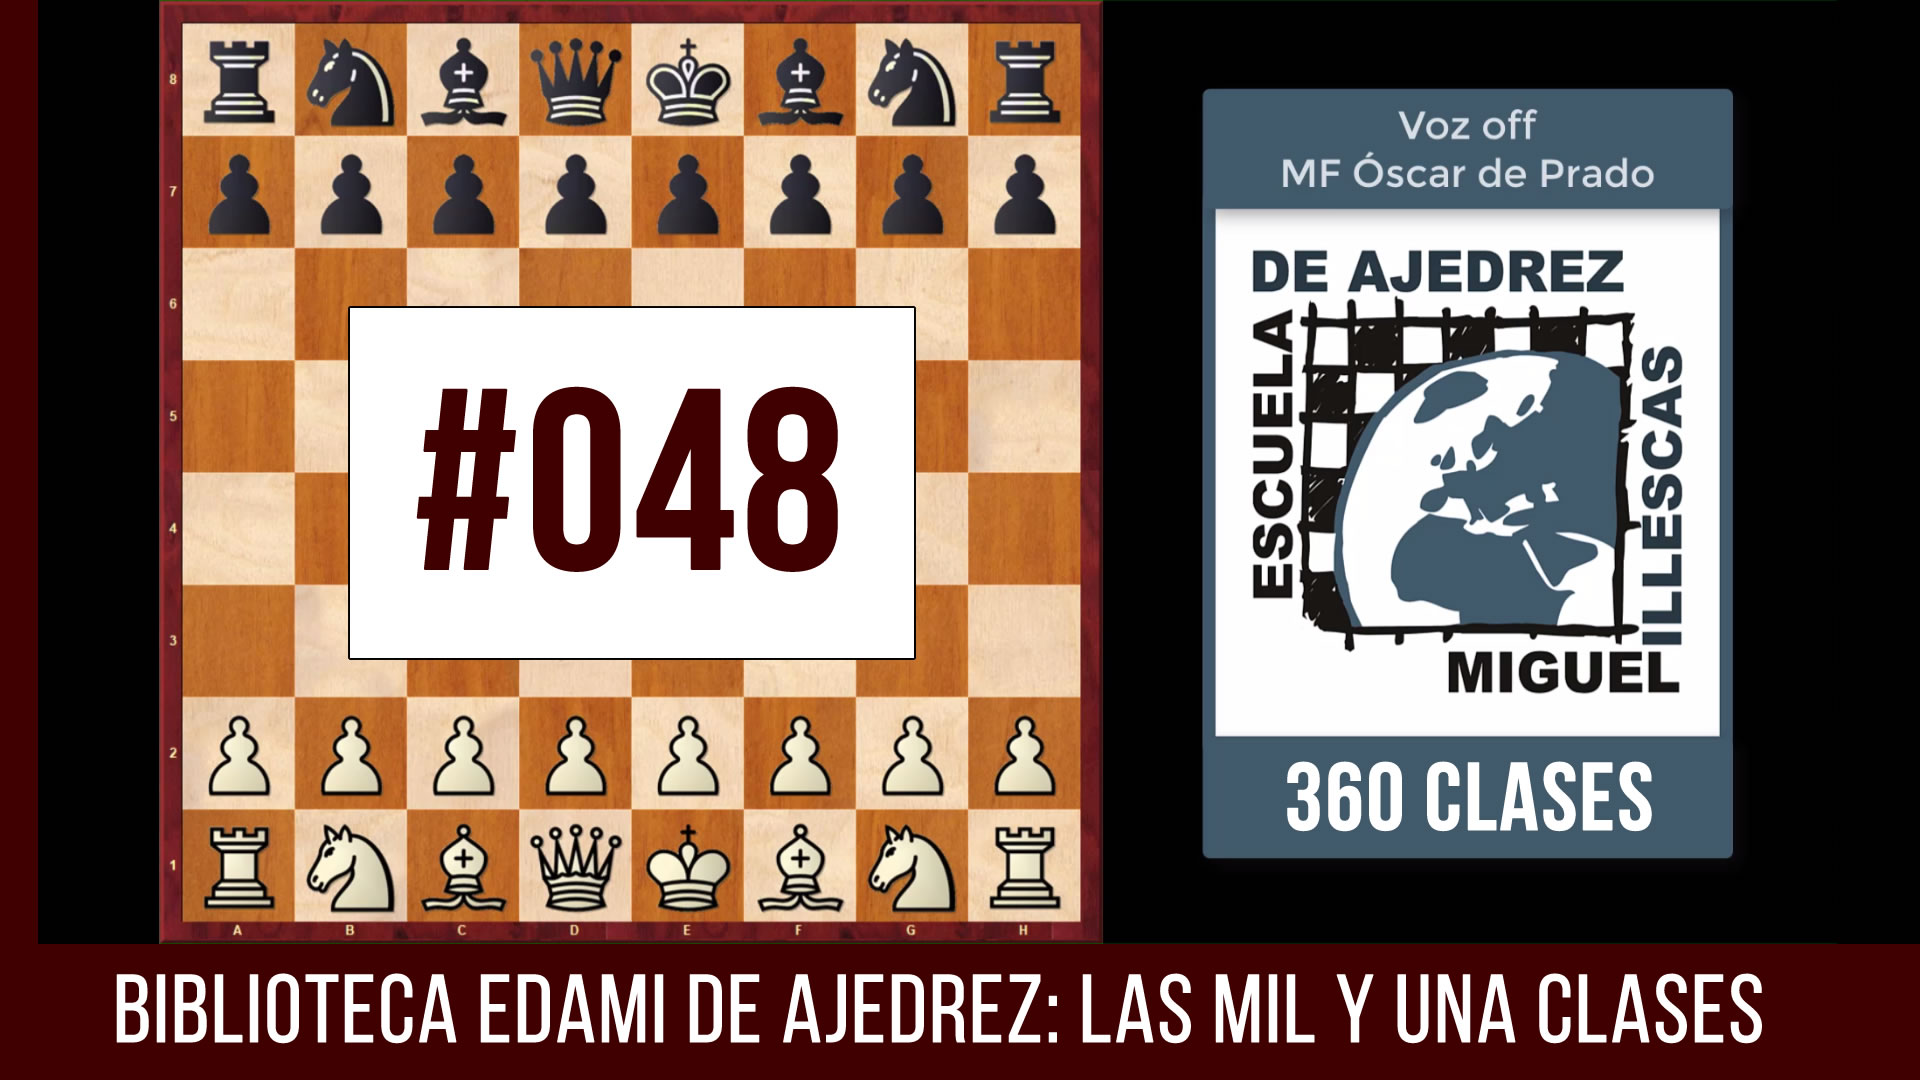 Clases de ajedrez #048 - EDAMI